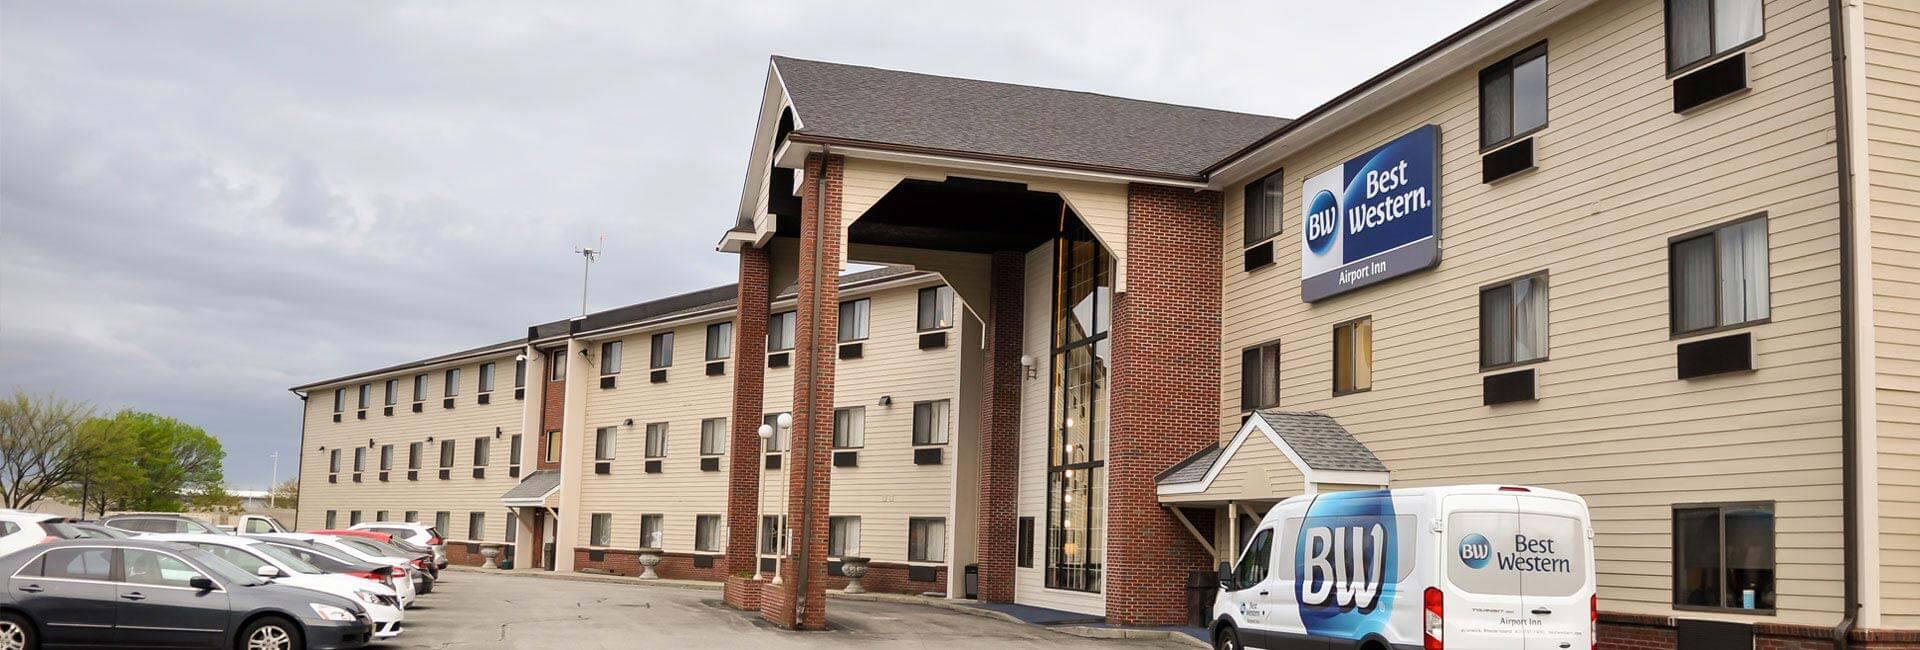 Best Western Airport Inn Hotel at Warwick